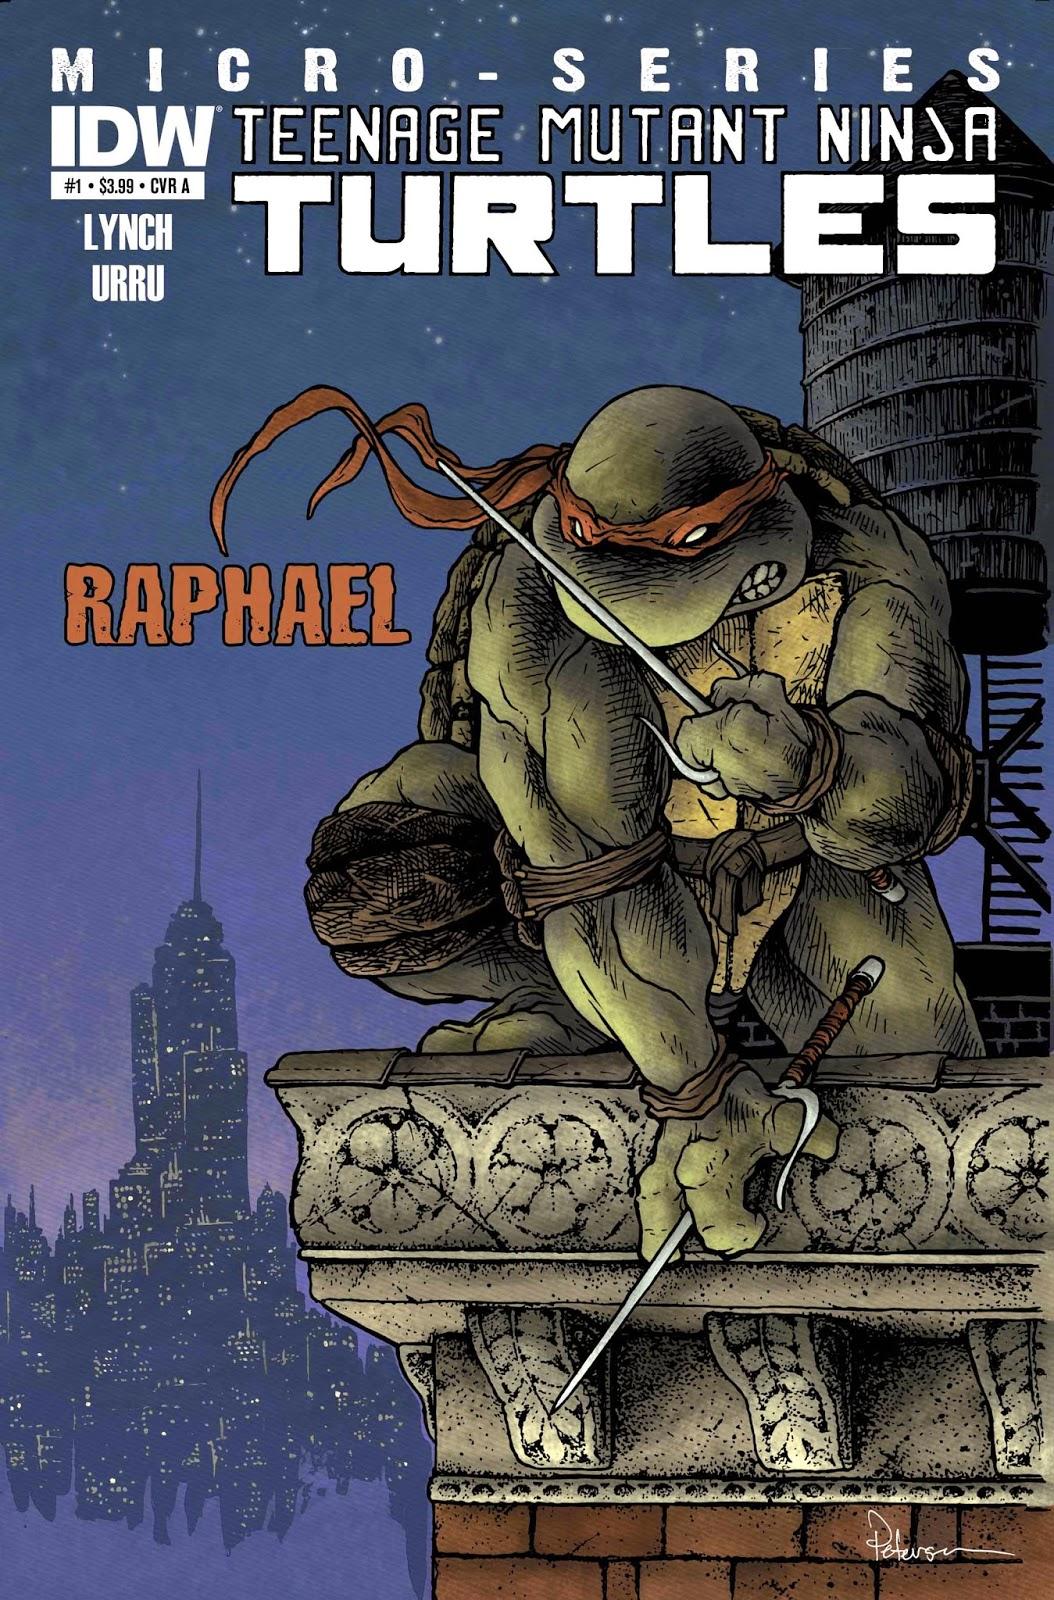 Rafael de las Tortugas Ninjas